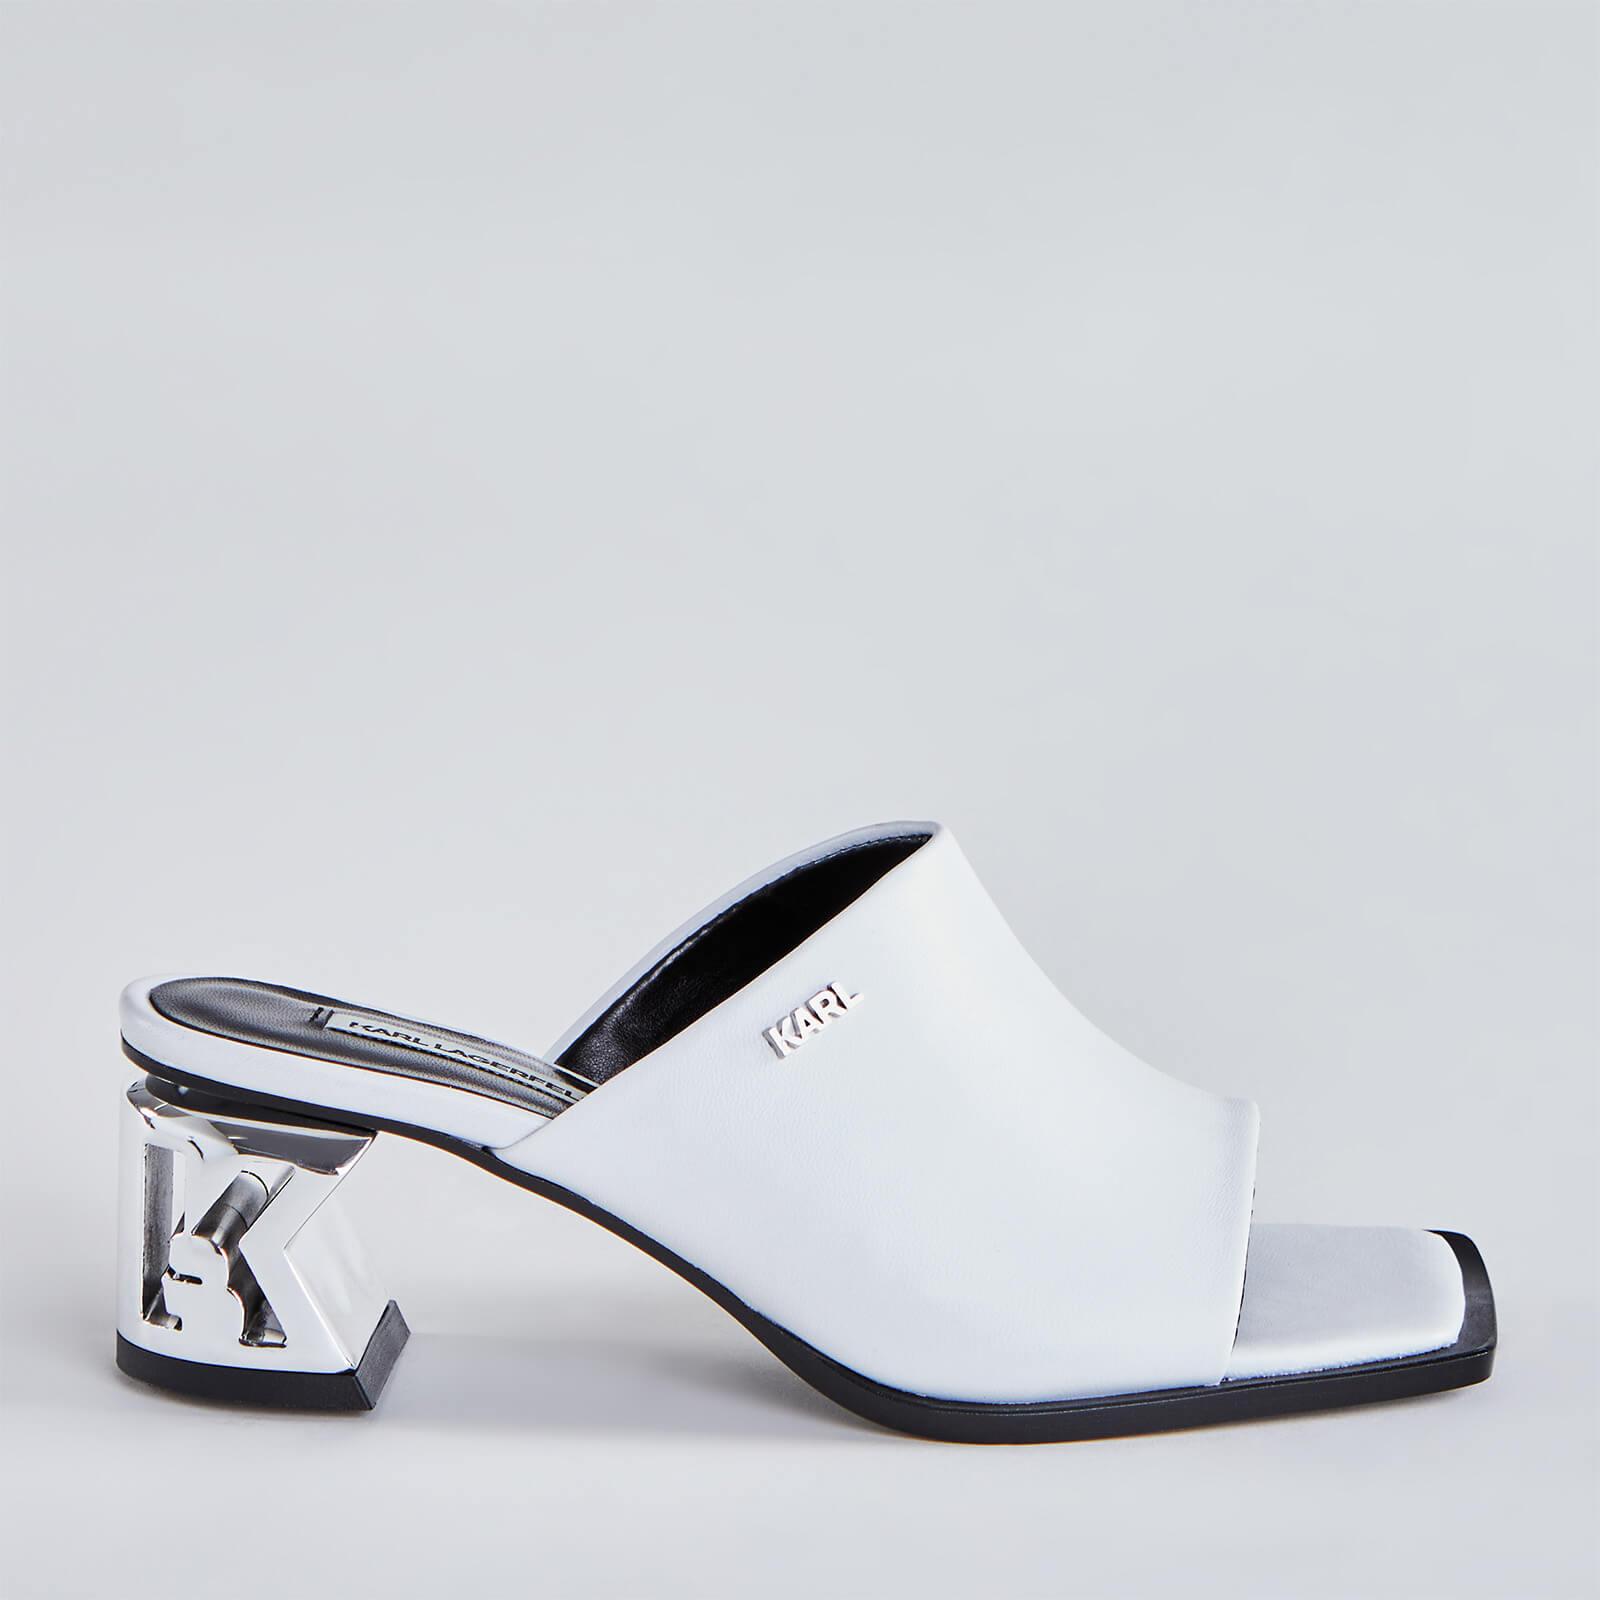 Karl Lagerfeld Women's K-Blok Leather Square Toe Heeled Mules - White - UK 4